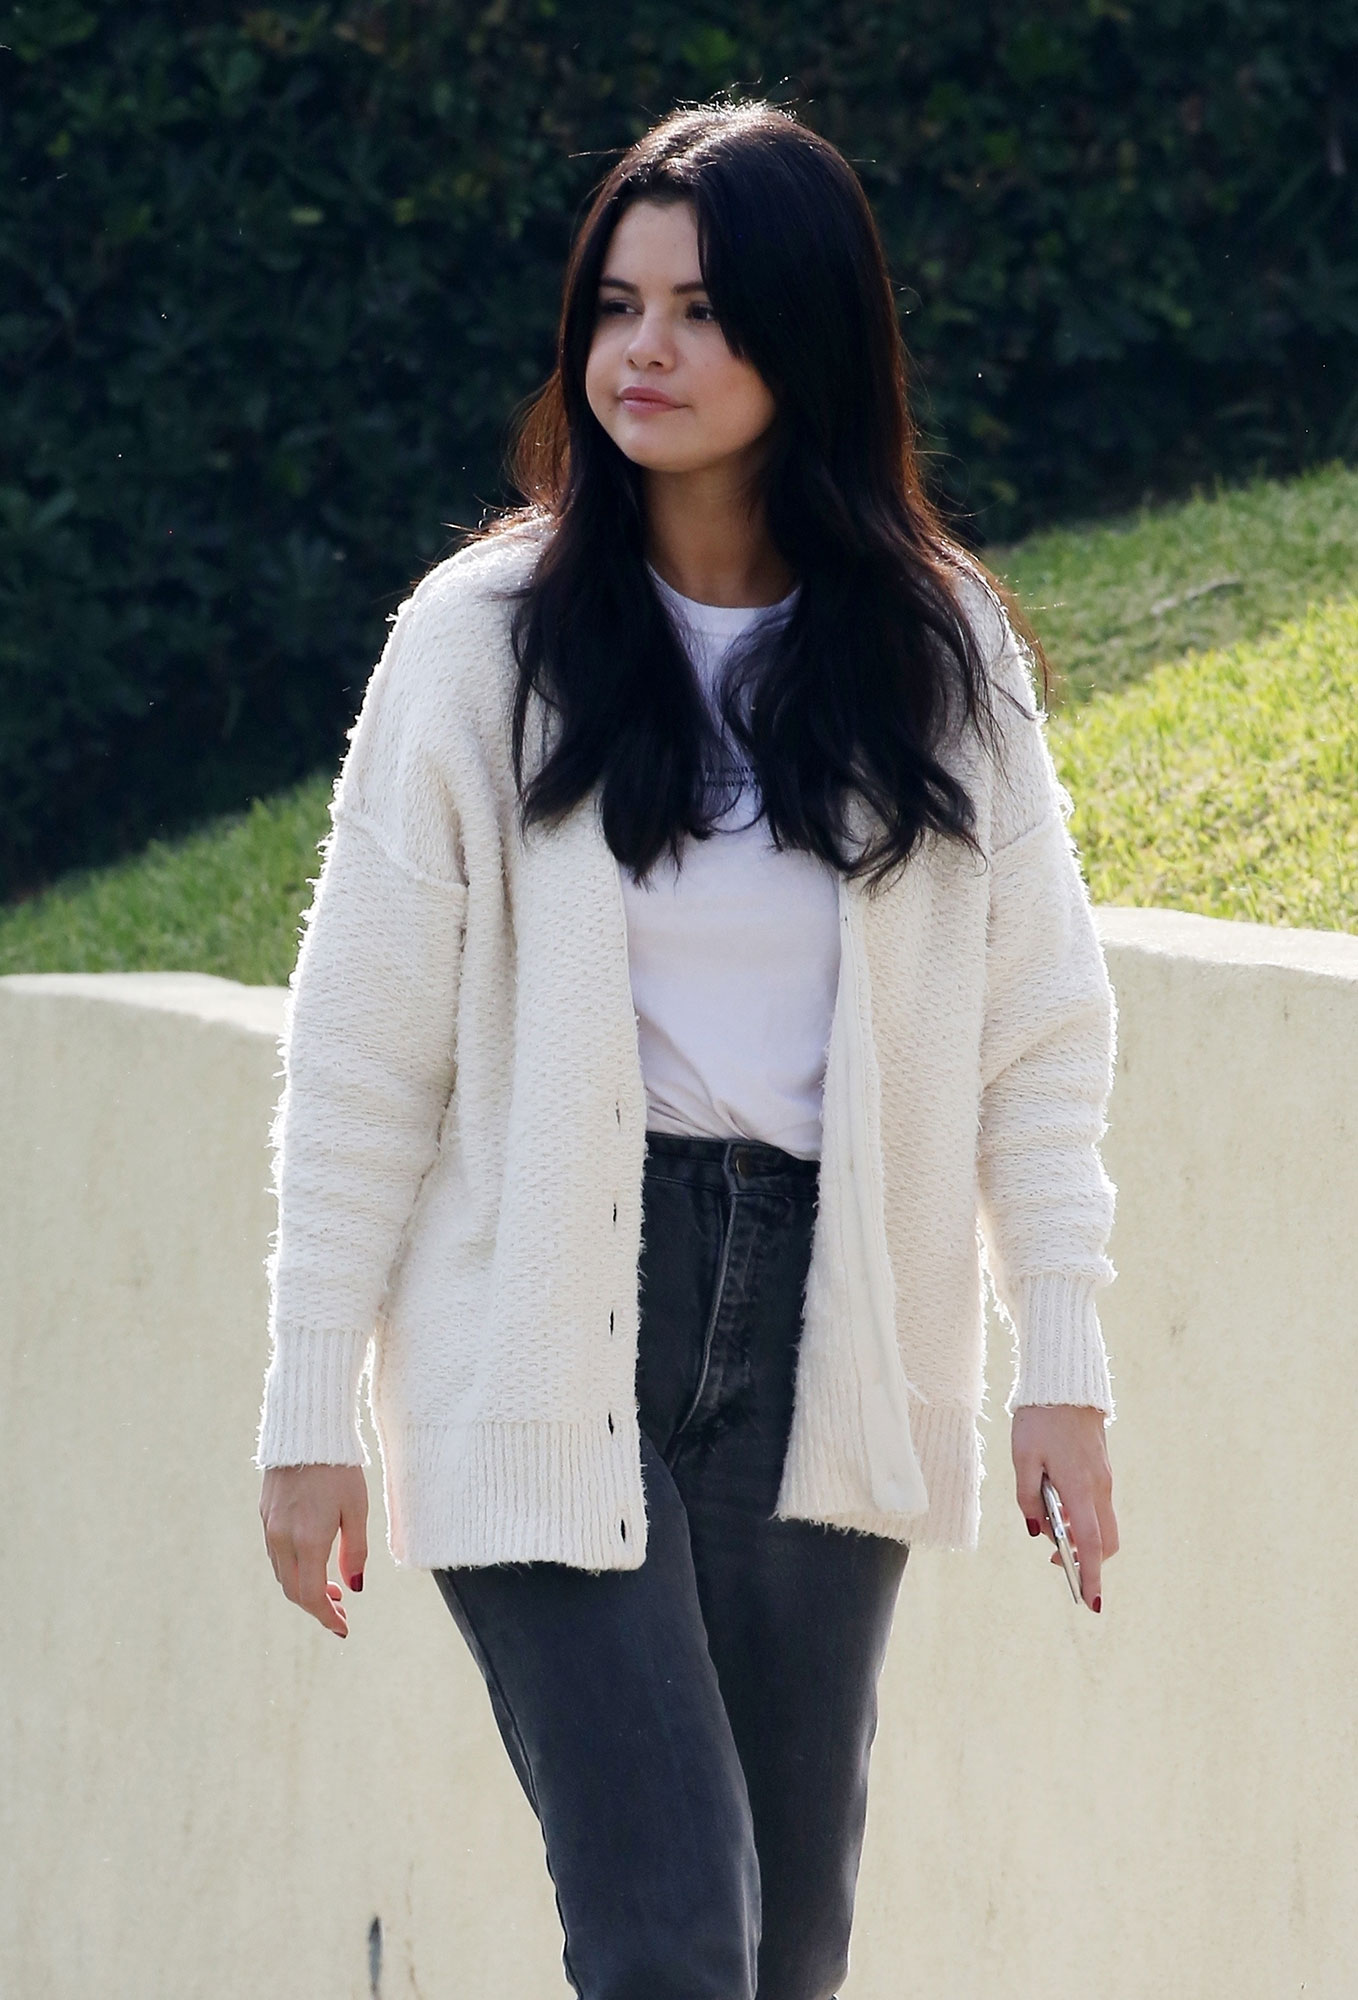 Selena Gomez Looks Healthy in L.A., Plus Nick & Priyanka, J.Lo & A.Rod and More